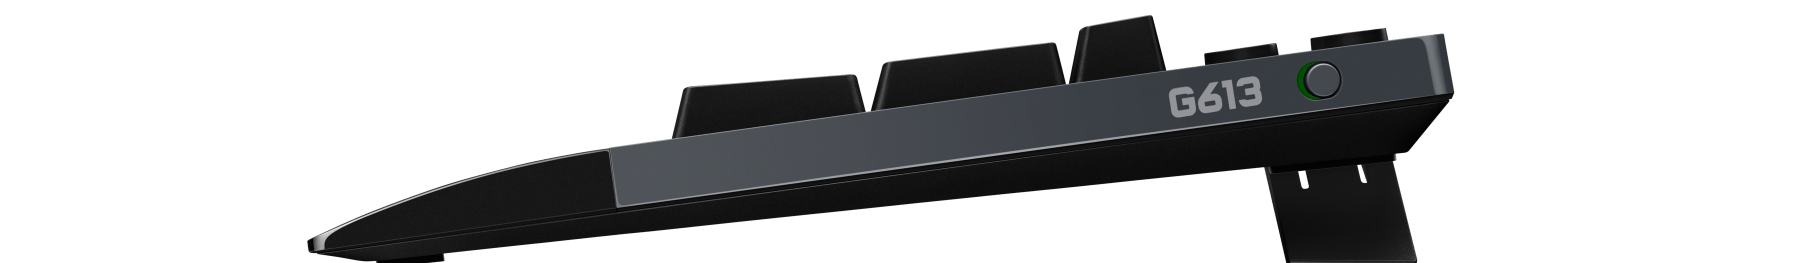 G613 | AA batteries